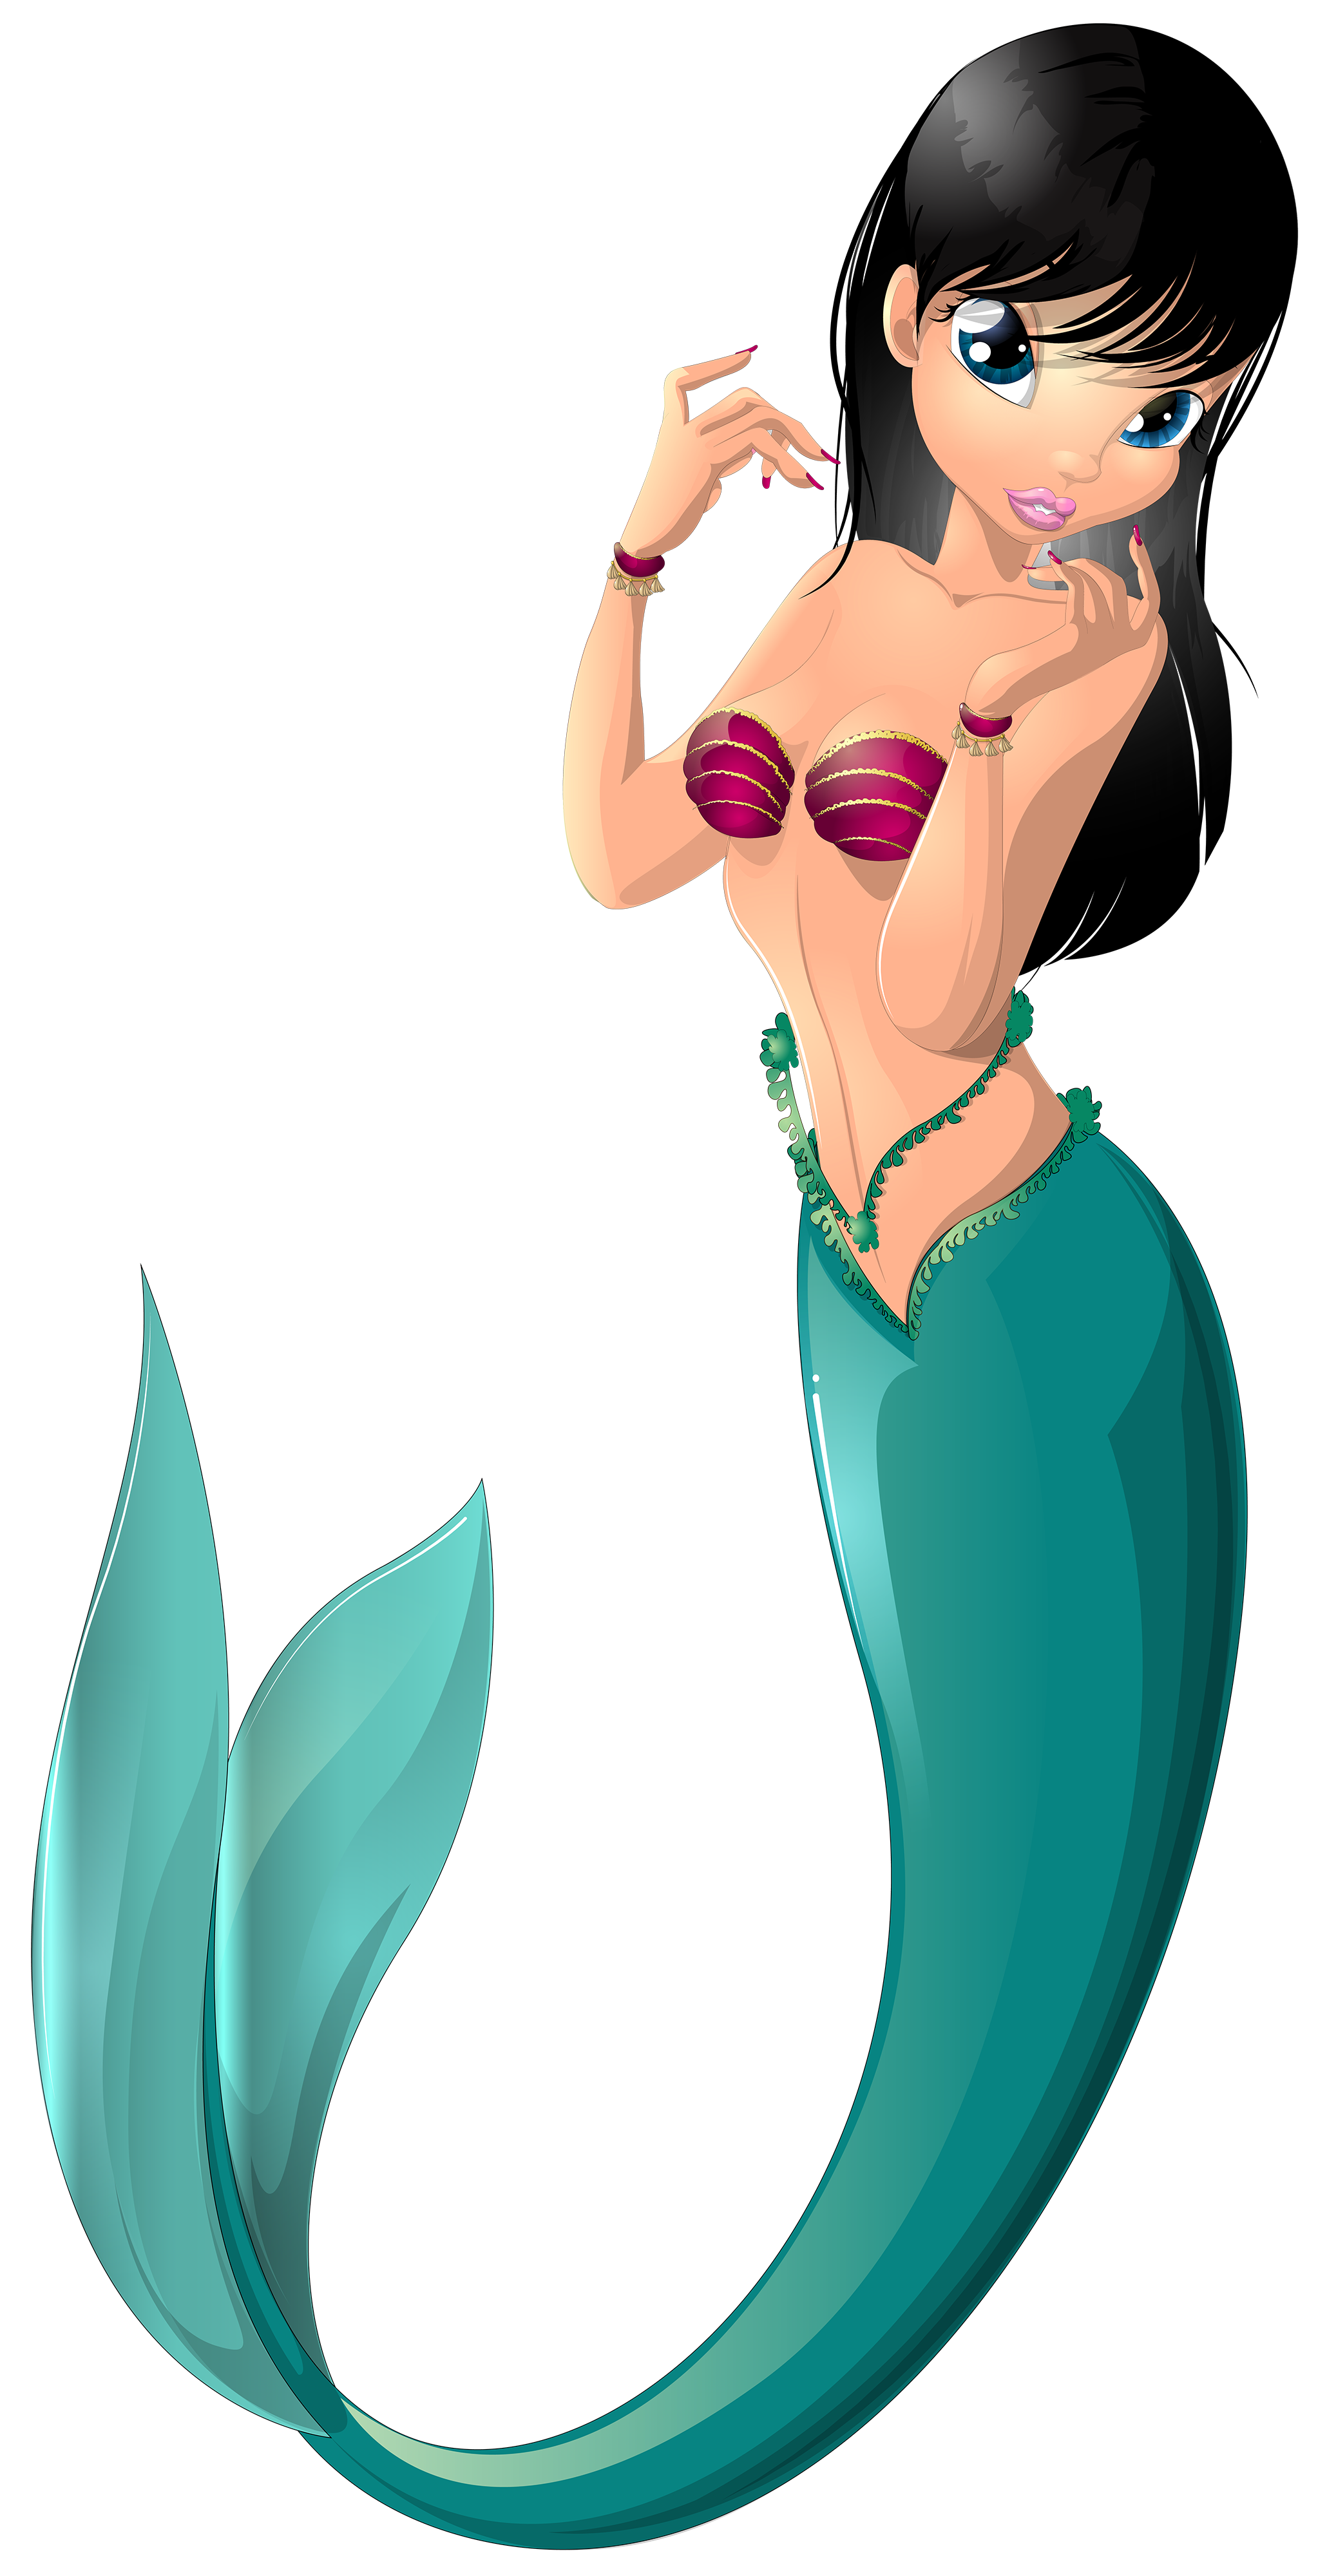 2060x4000 Cartoon Mermaid Clipart Free Clip Art Images Image 4